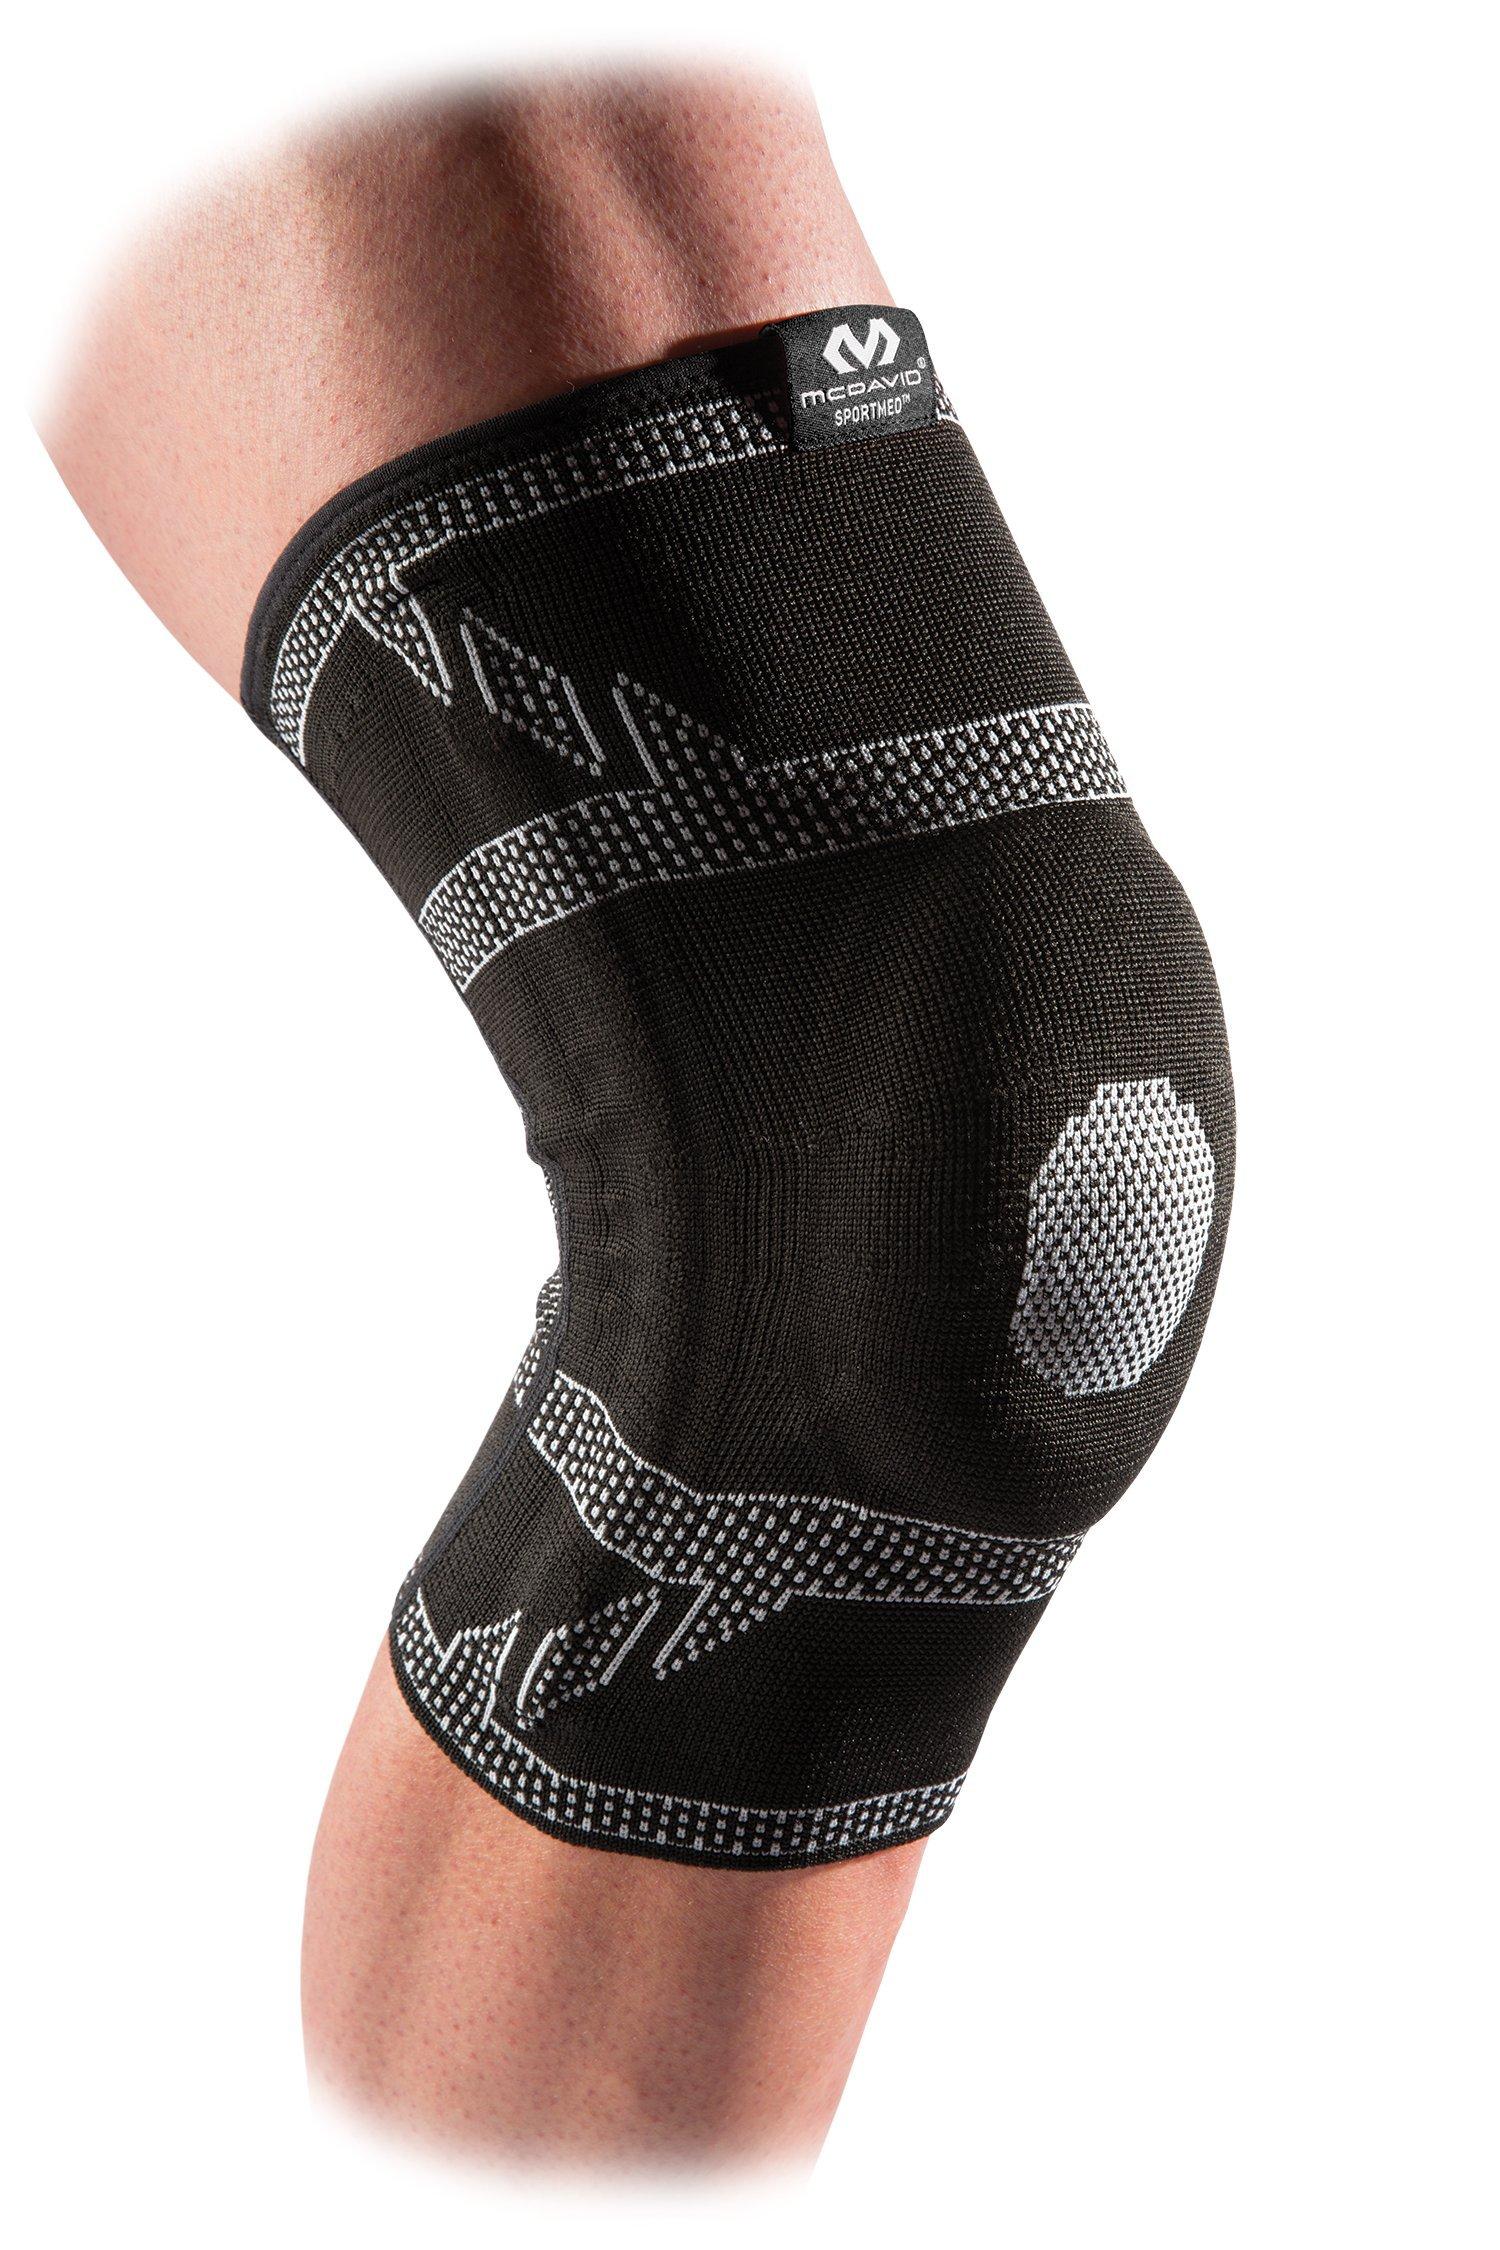 McDavid 5133ELITE 工程弹性带凝胶支撑护膝和竹与压缩护膝适用于膝盖*